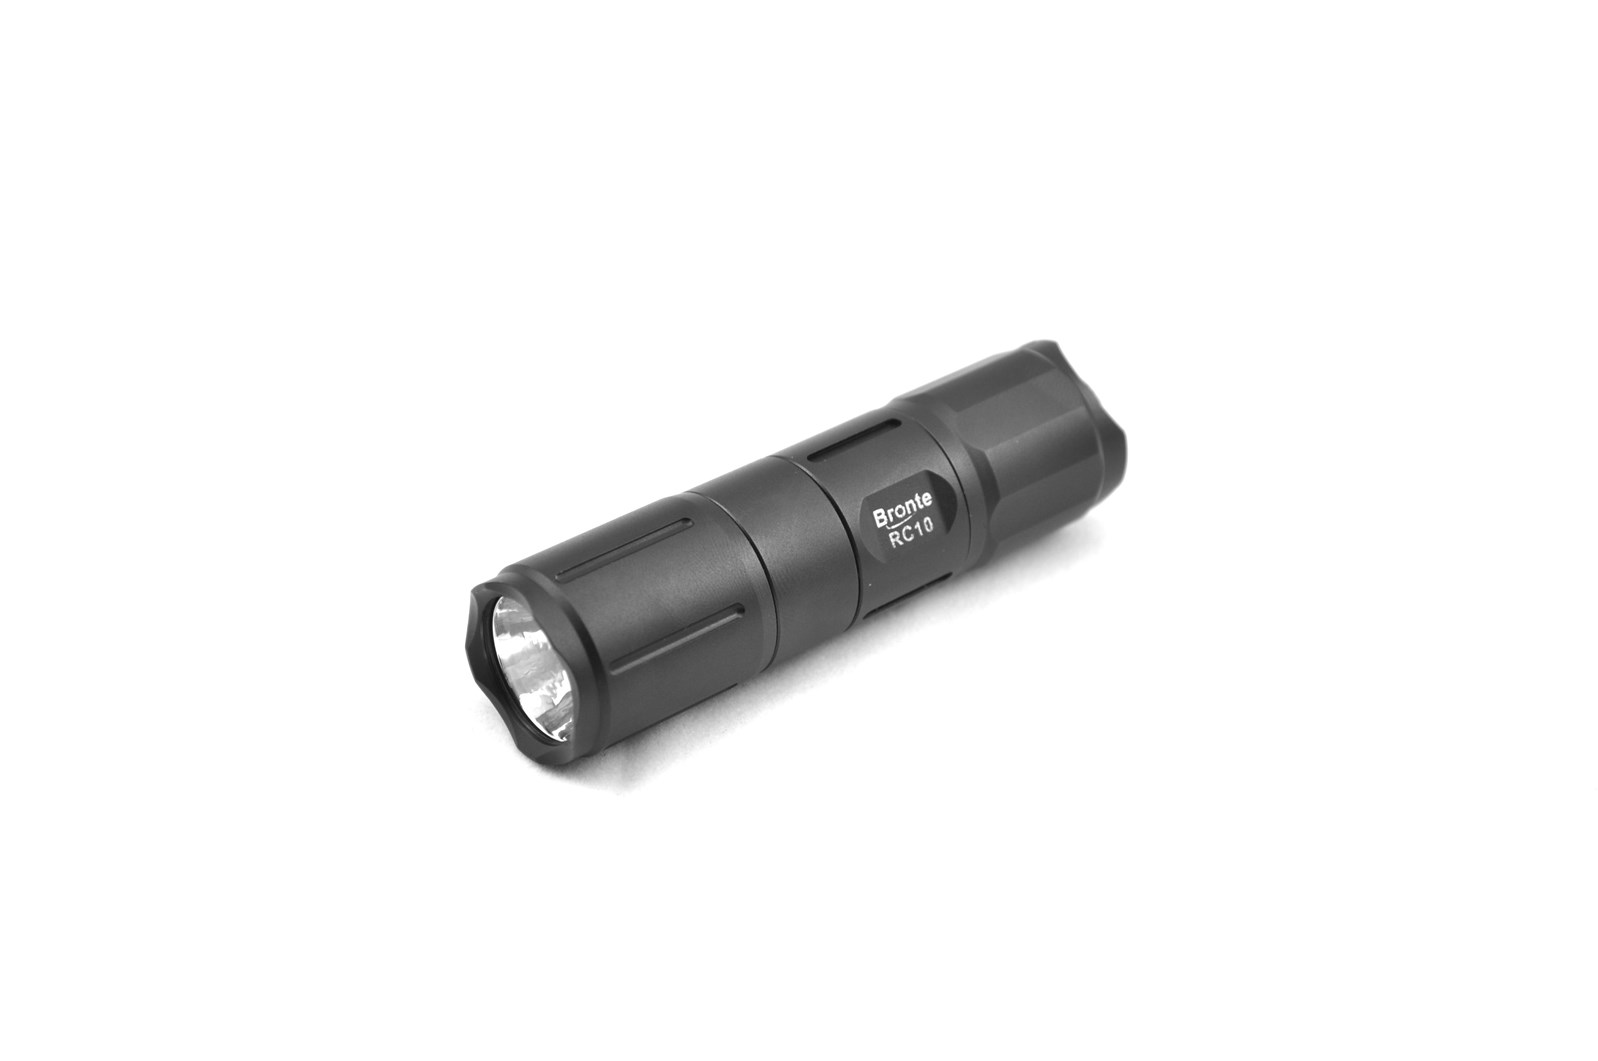 LED svítilna Bronte RC10